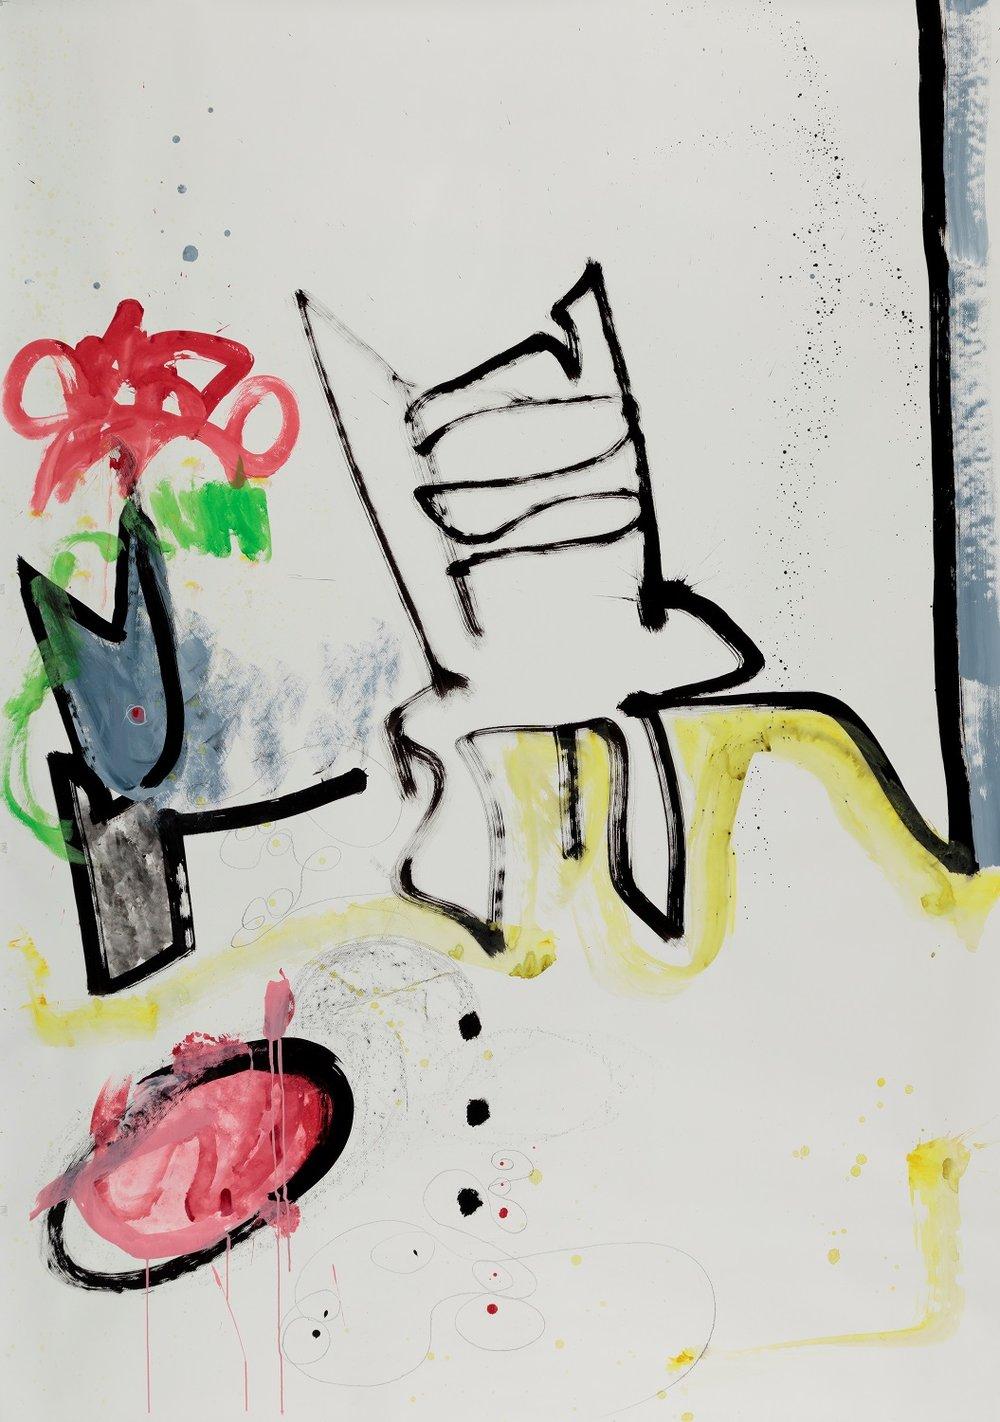 Laura Shabott - Blue Chair #1